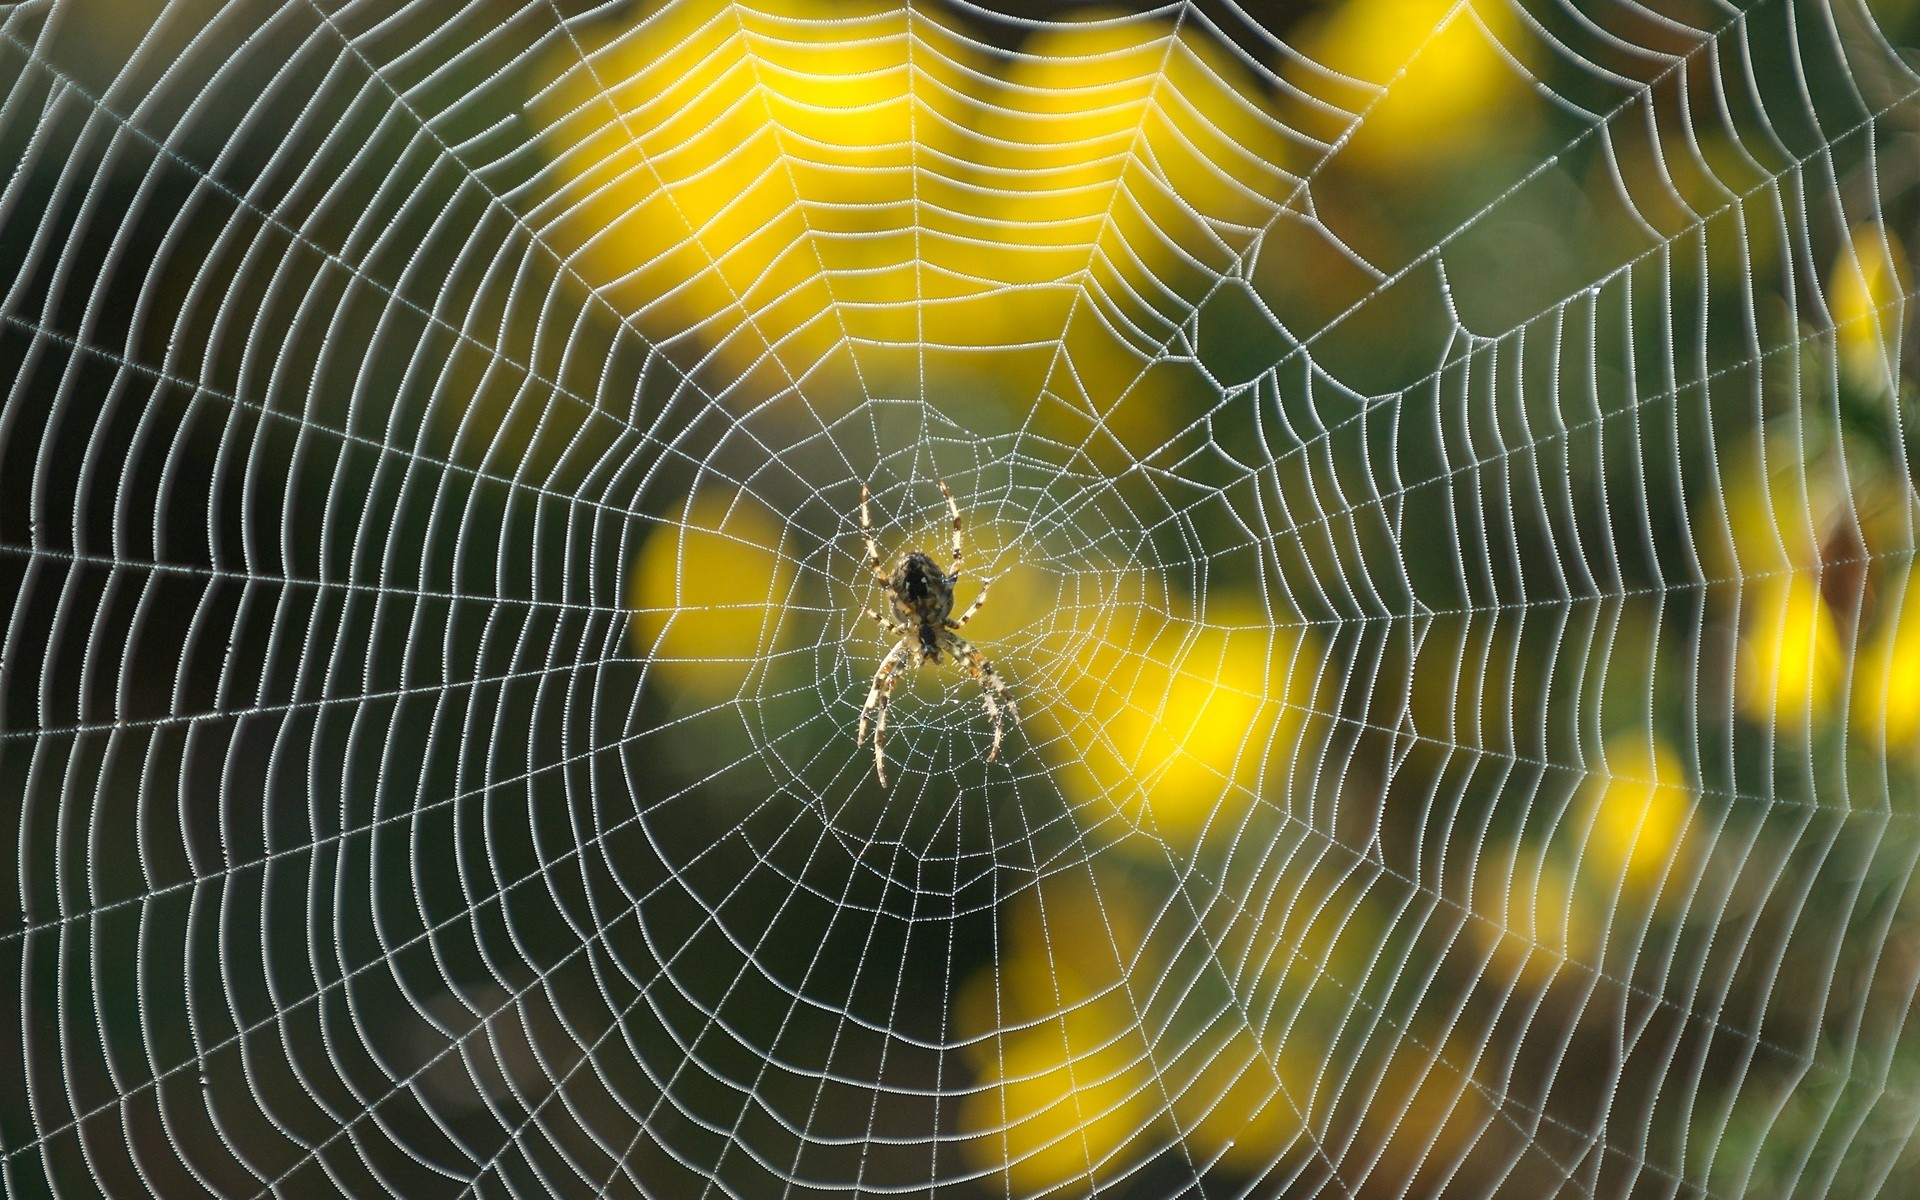 0 Spider Wallpapers Best Wallpapers Spider Wallpapers